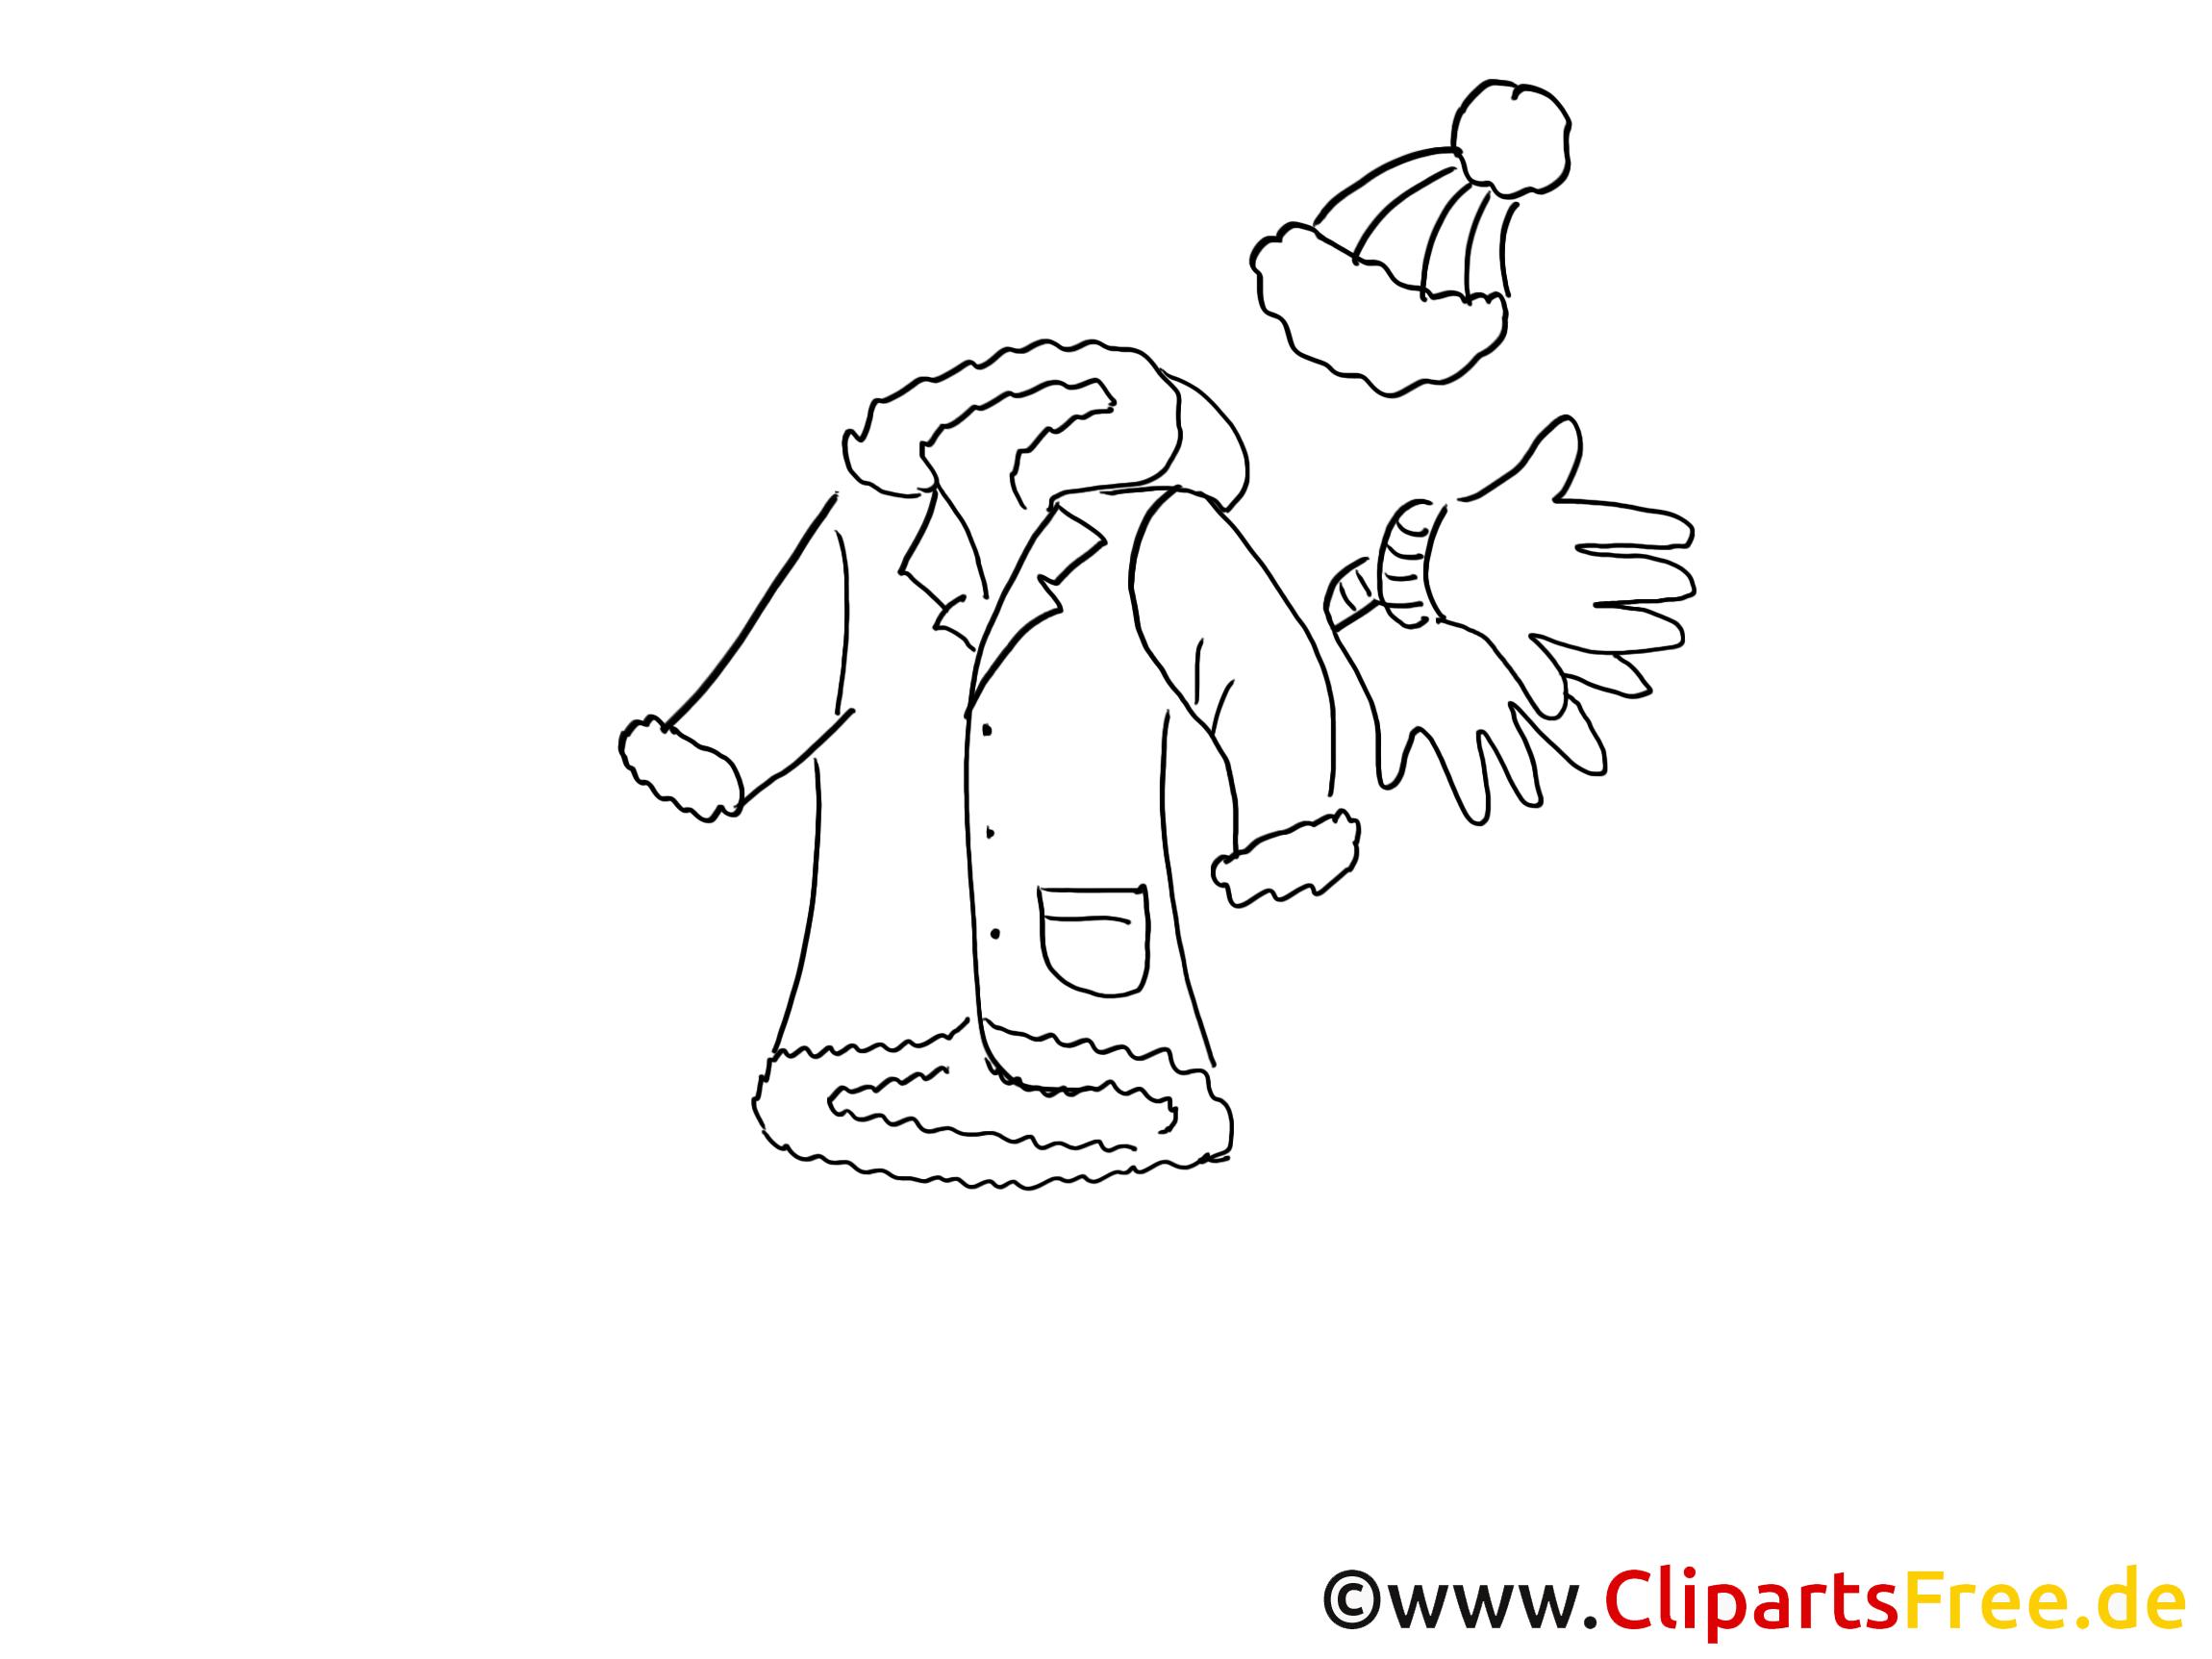 Outdoormode Clipart, Bild, Illustration, Grafik,  Image kostenlos